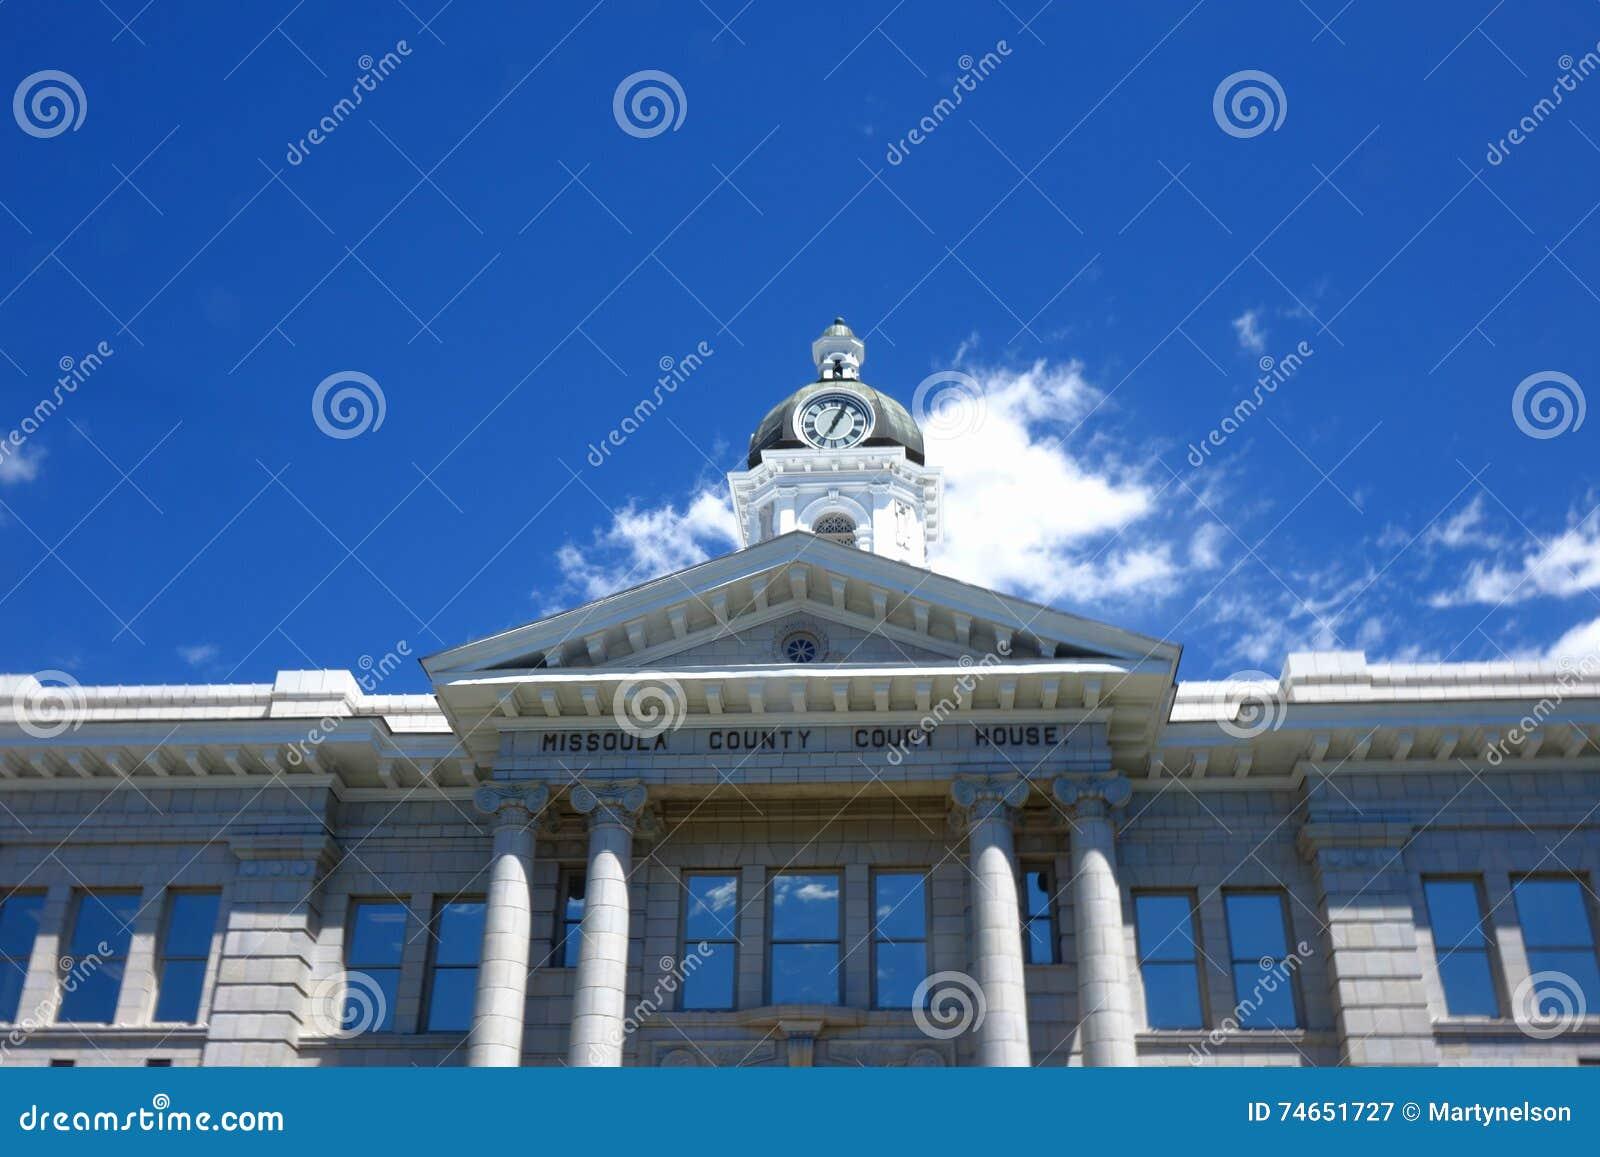 Tribunal de Missoula County - Montana